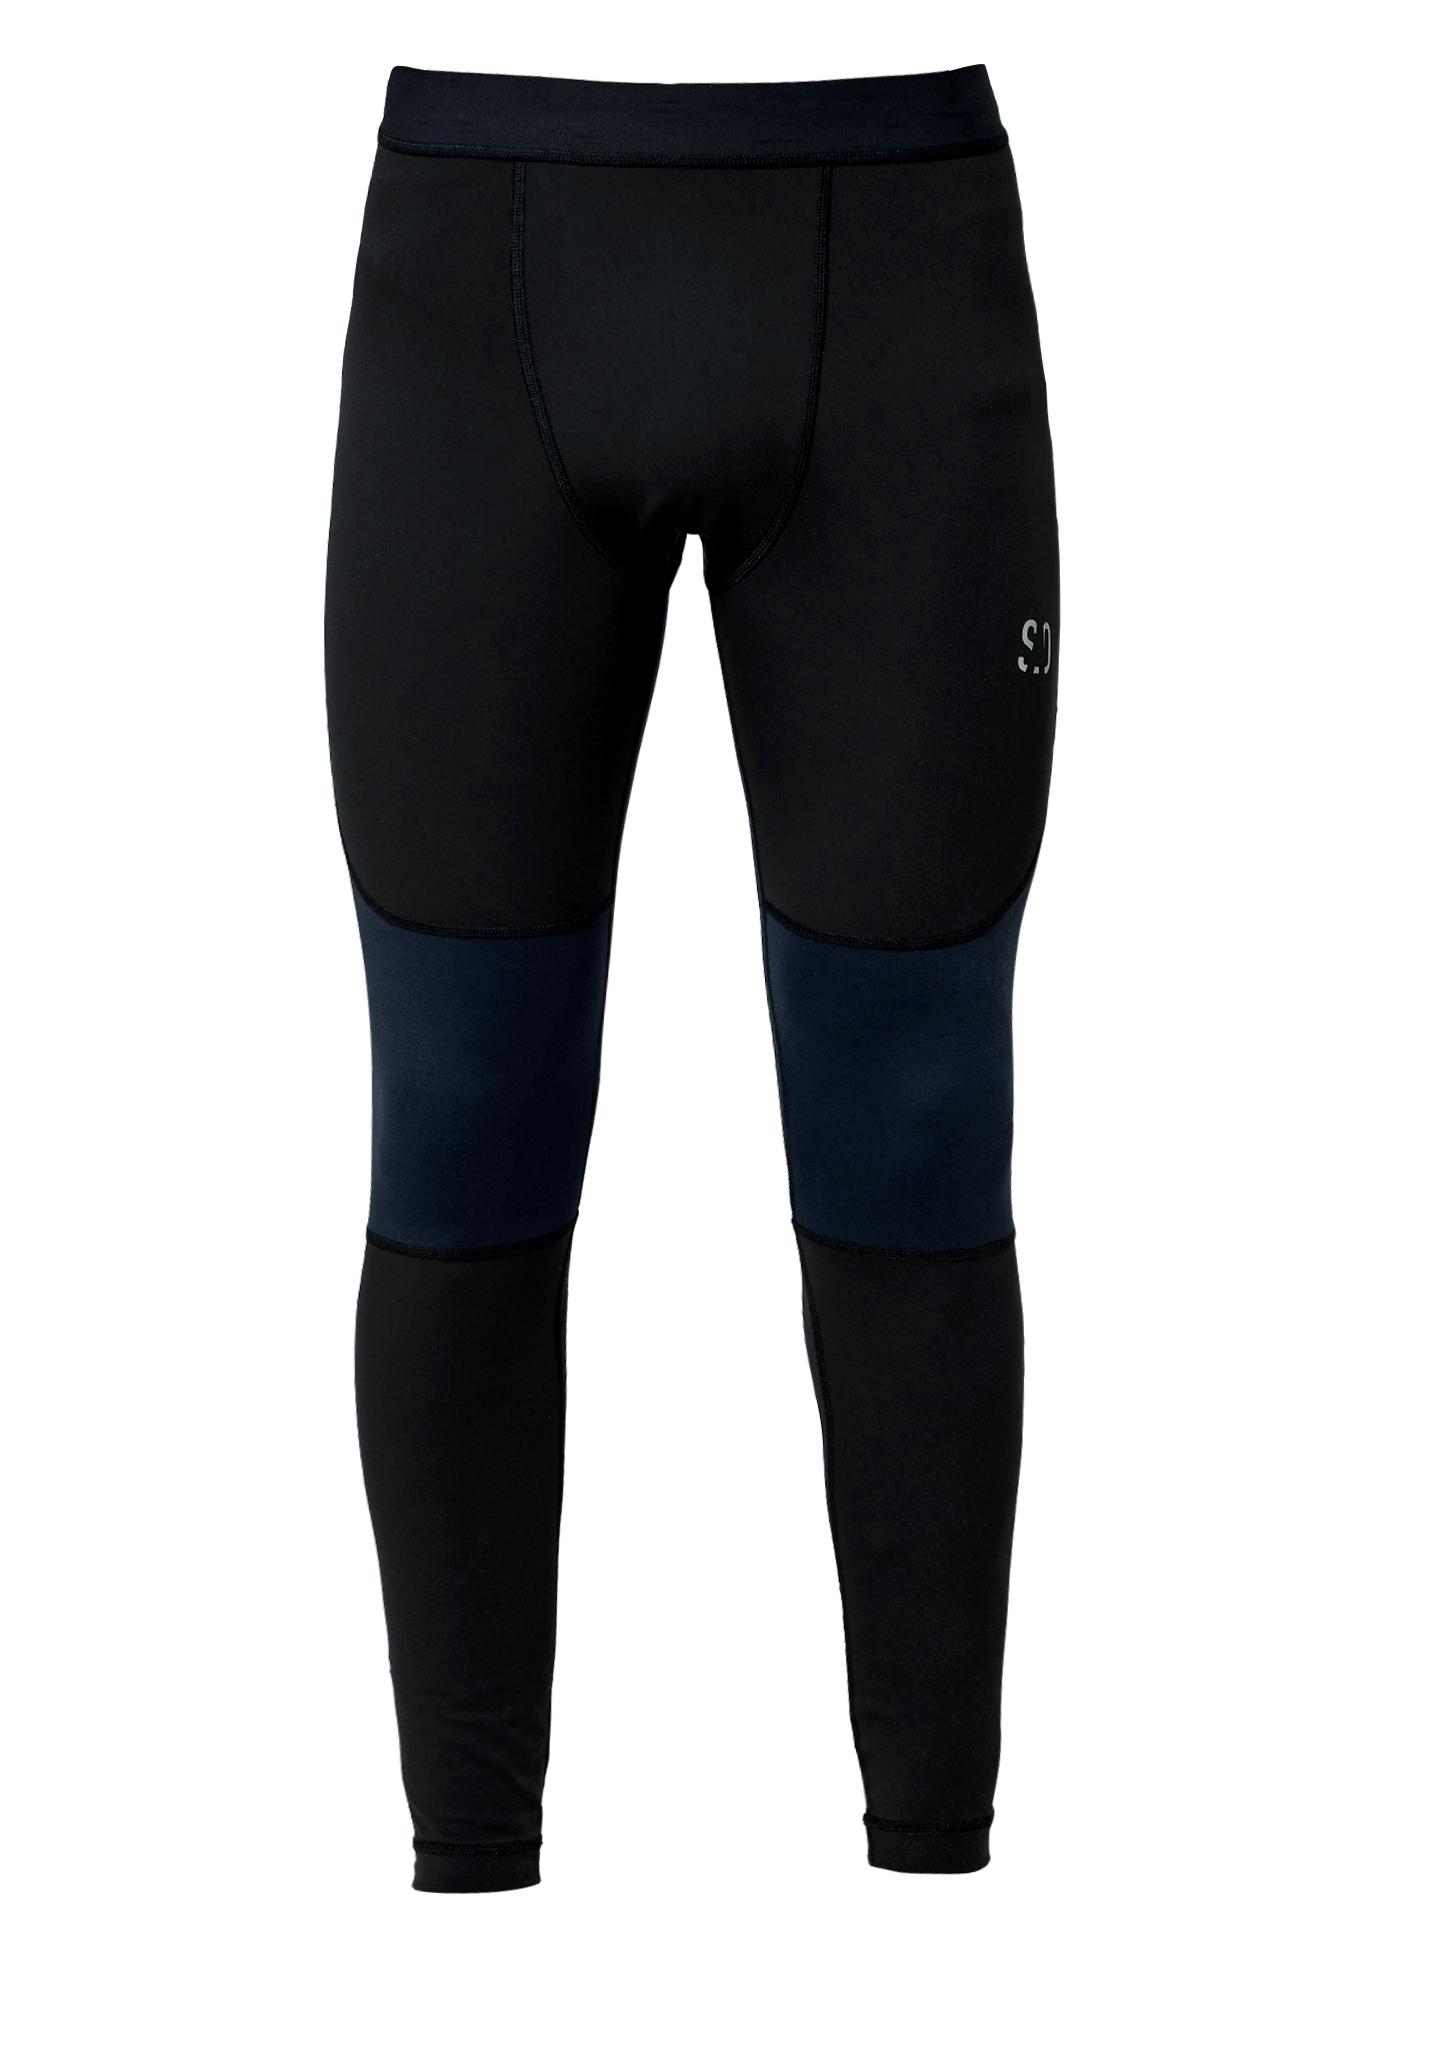 Trainings Tights | Sportbekleidung > Sporthosen | Grau/schwarz | Obermaterial: 78% polyamid -  22% elasthan| futter: 85% polyamid -  15% elasthan | s.Oliver ACTIVE